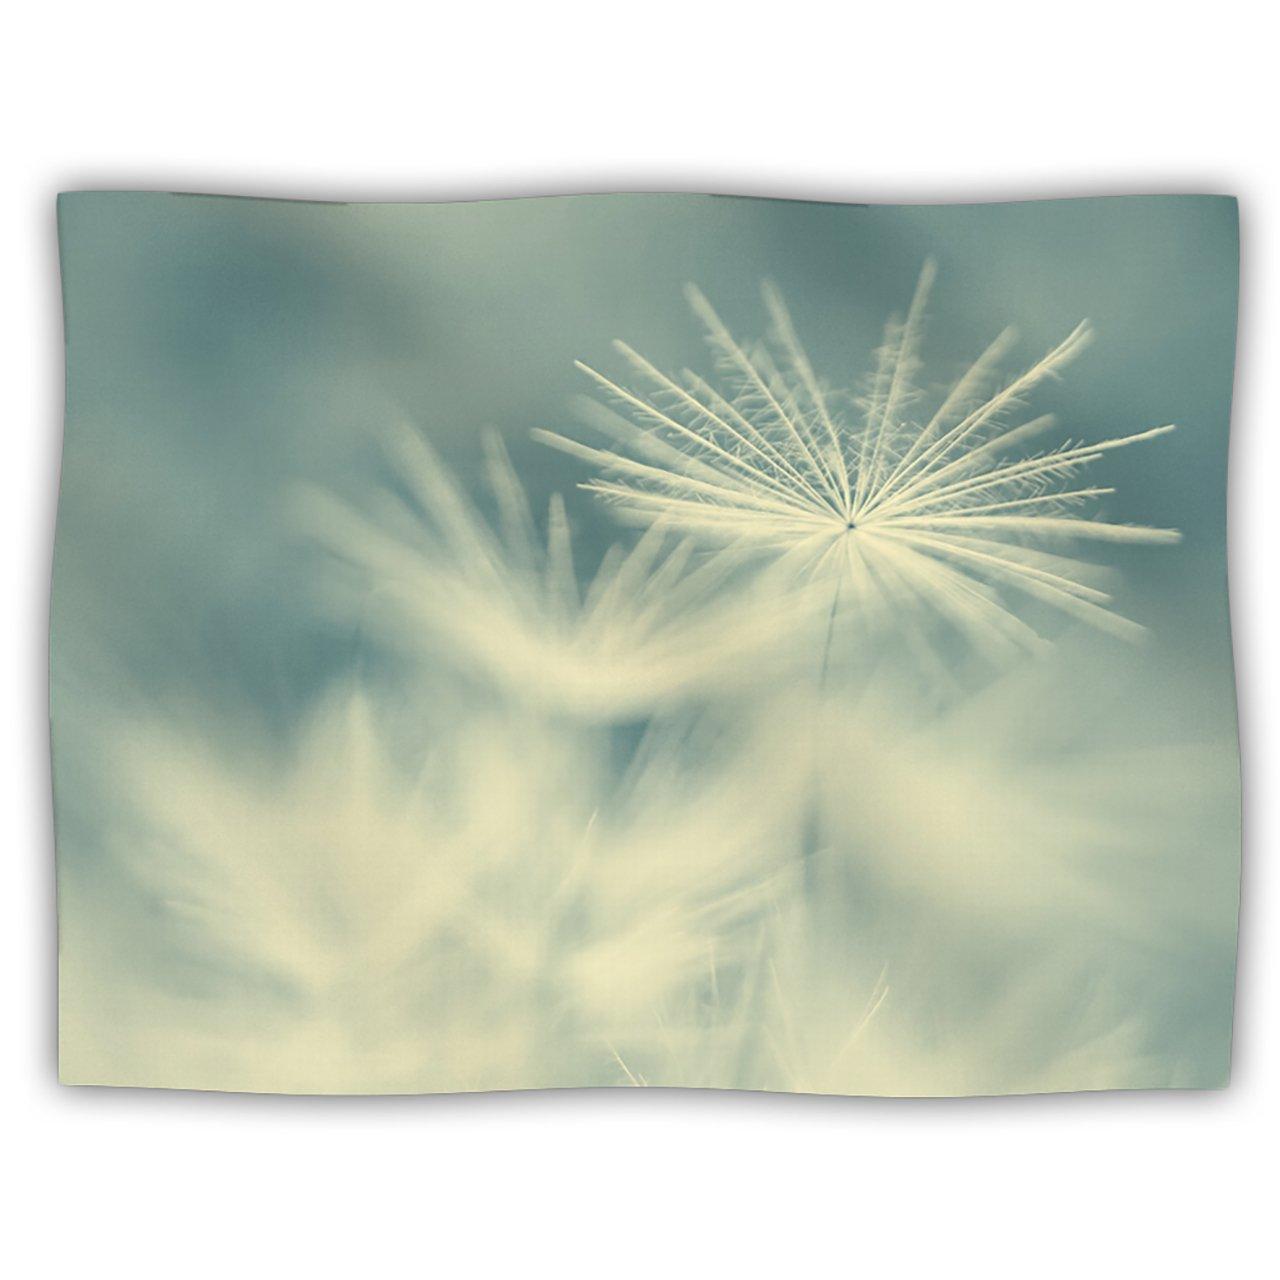 Kess InHouse Ingrid Beddoes  Snowflake Teal White  Dog Blanket, 60 by 50-Inch